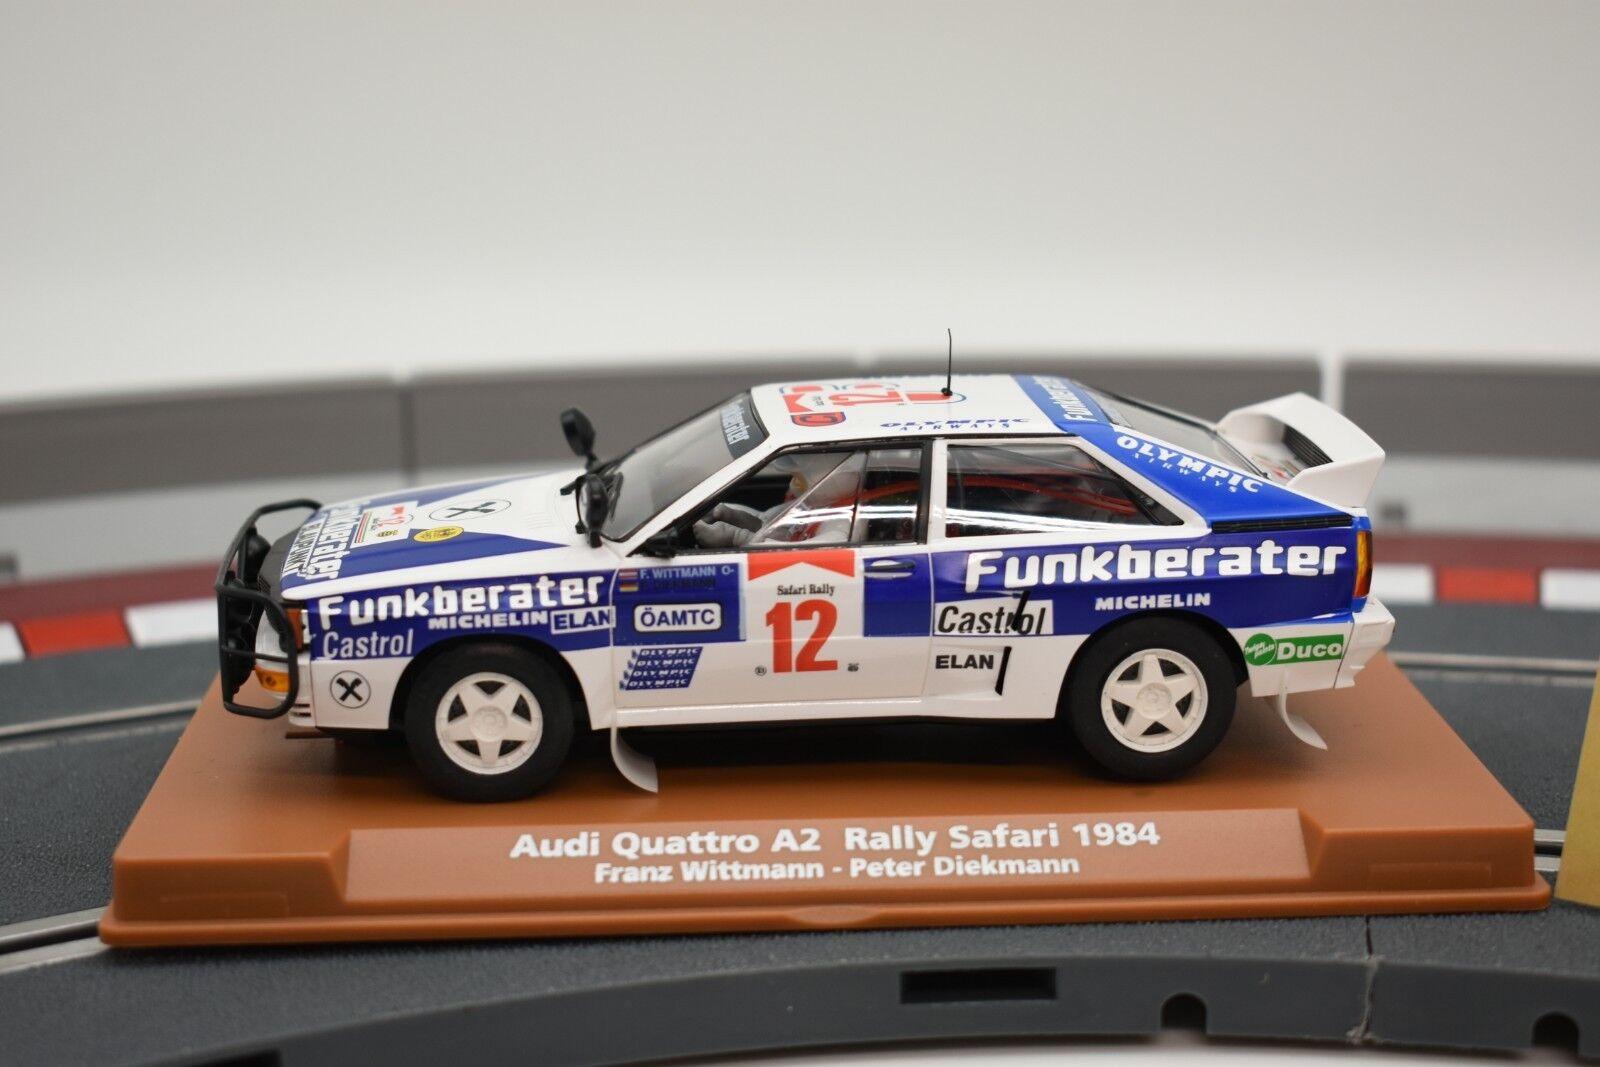 96097 FLY CAR MODEL 1 32 SLOT CAR AUDI QUTTRO A2 SAFARI RALLY 1984